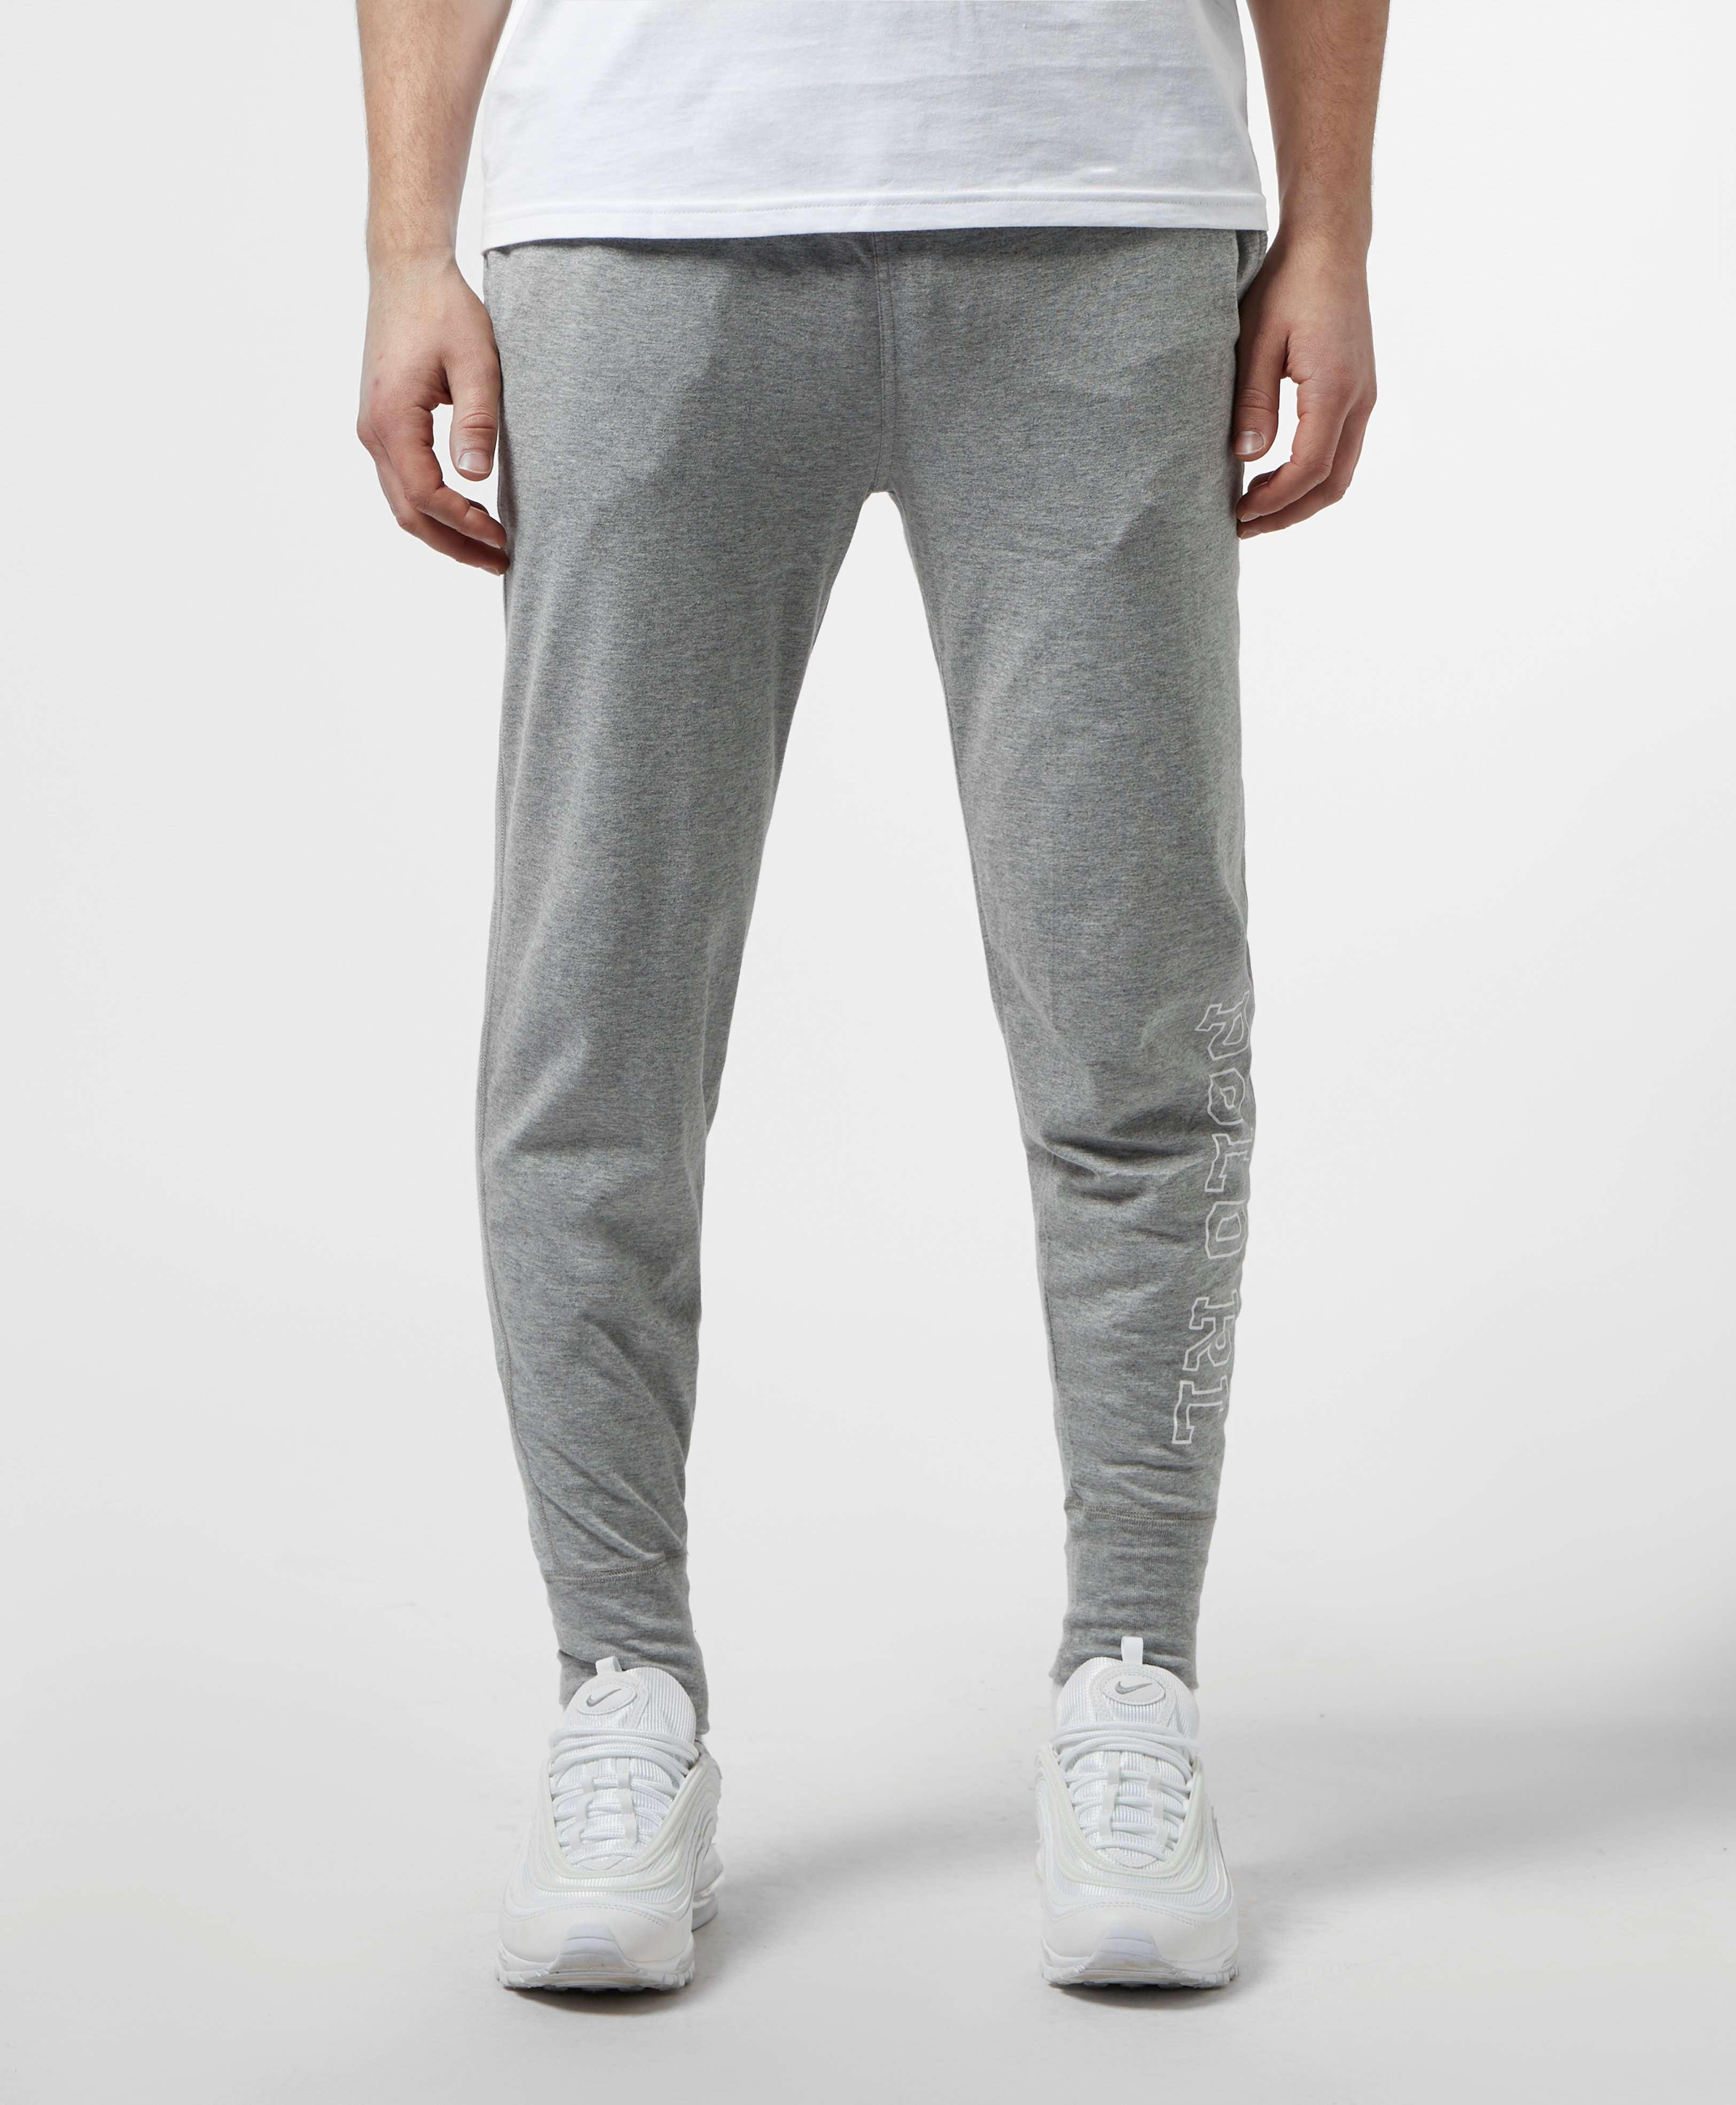 Polo Ralph Lauren Underwear Polo Fleece Pants